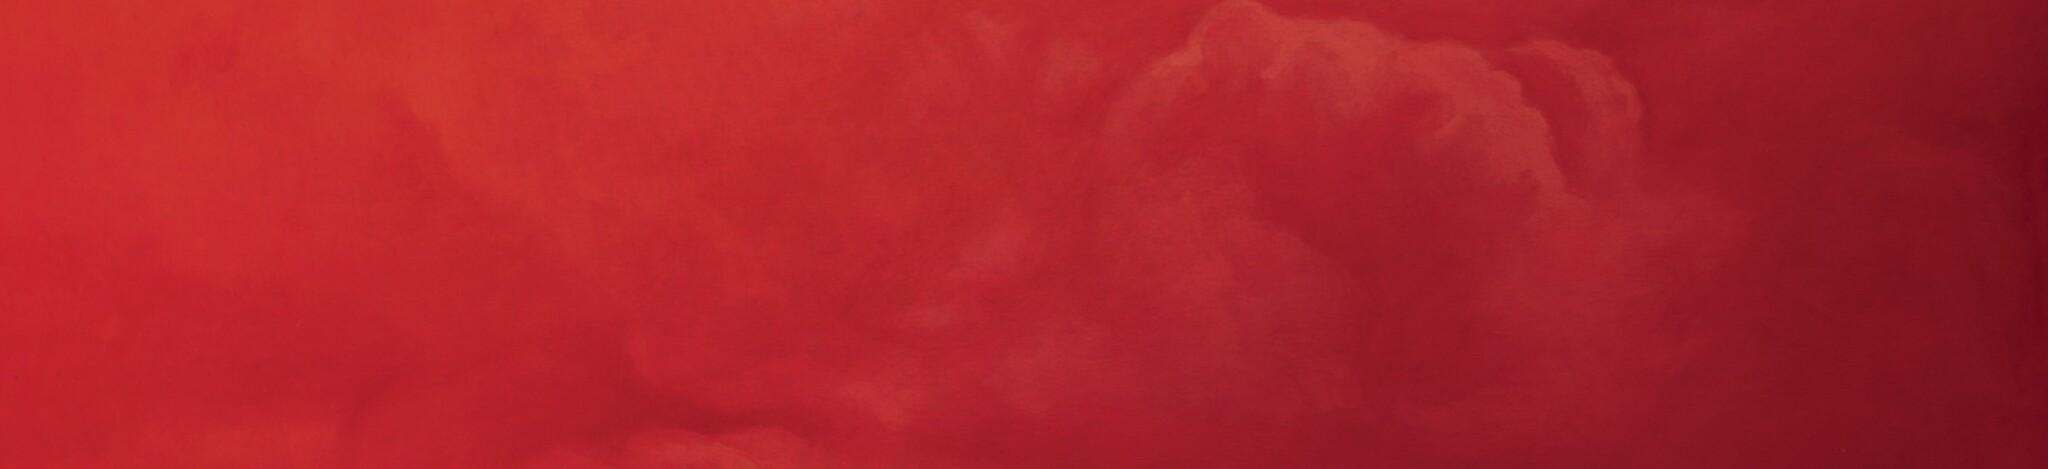 (RED) ONLINE